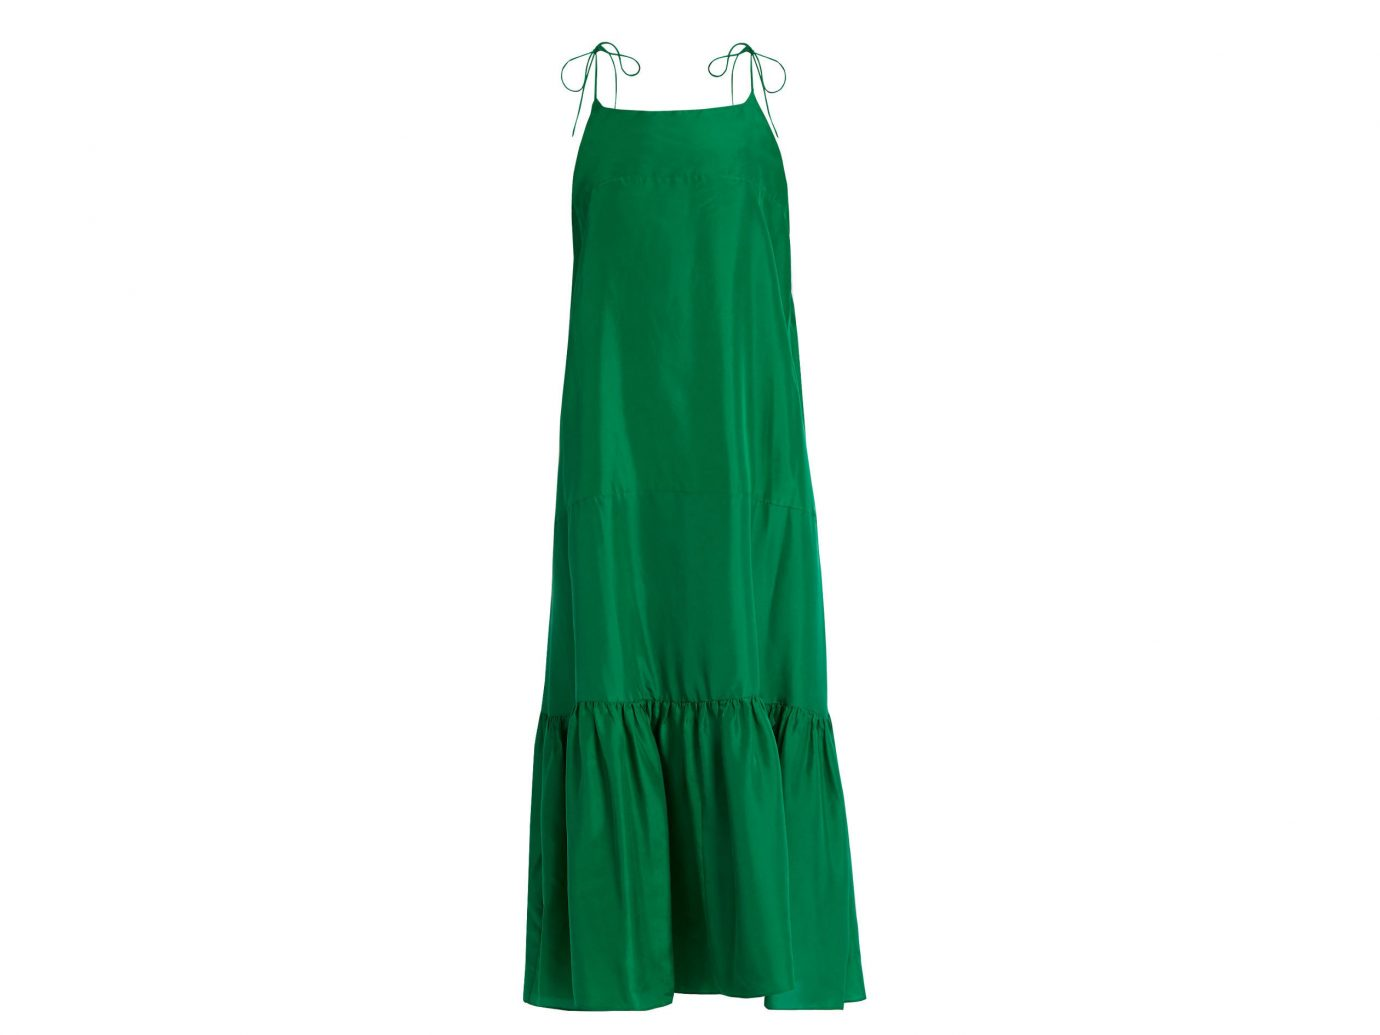 Style + Design Travel Shop day dress clothing green dress skirt waist active pants joint trouser